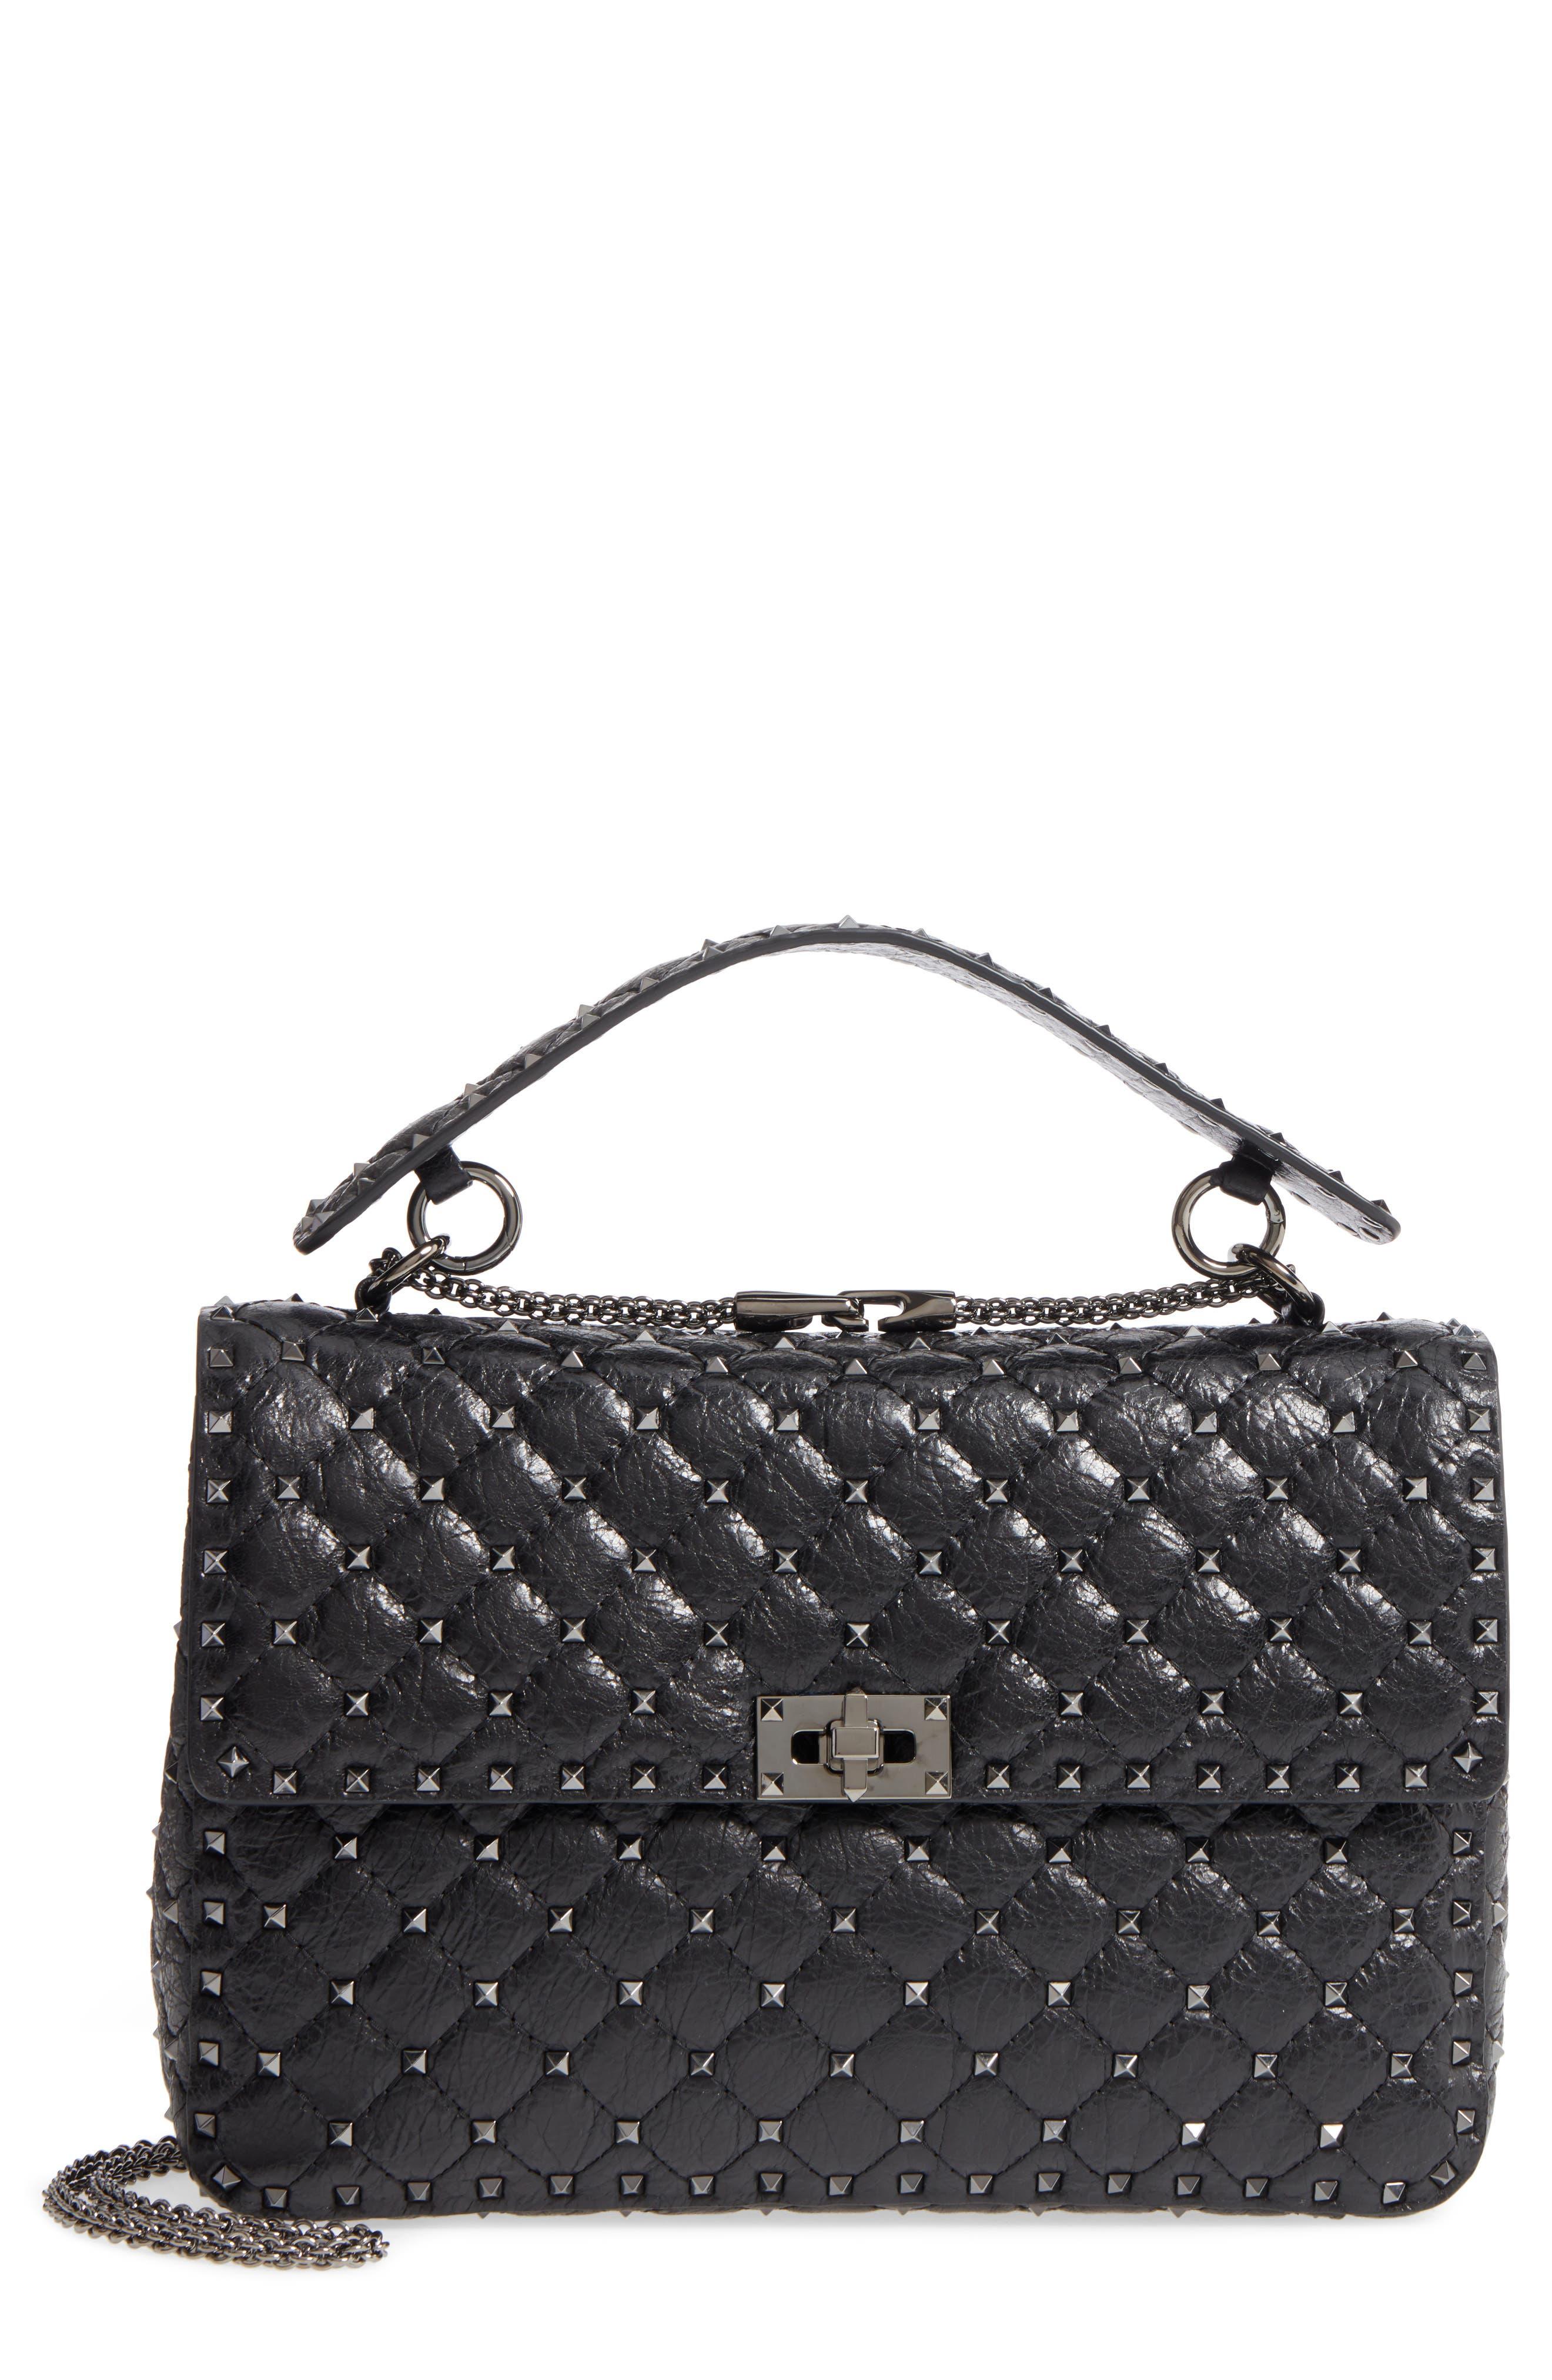 Vitello Rockstud Lambskin Leather Shoulder Bag,                             Main thumbnail 1, color,                             001